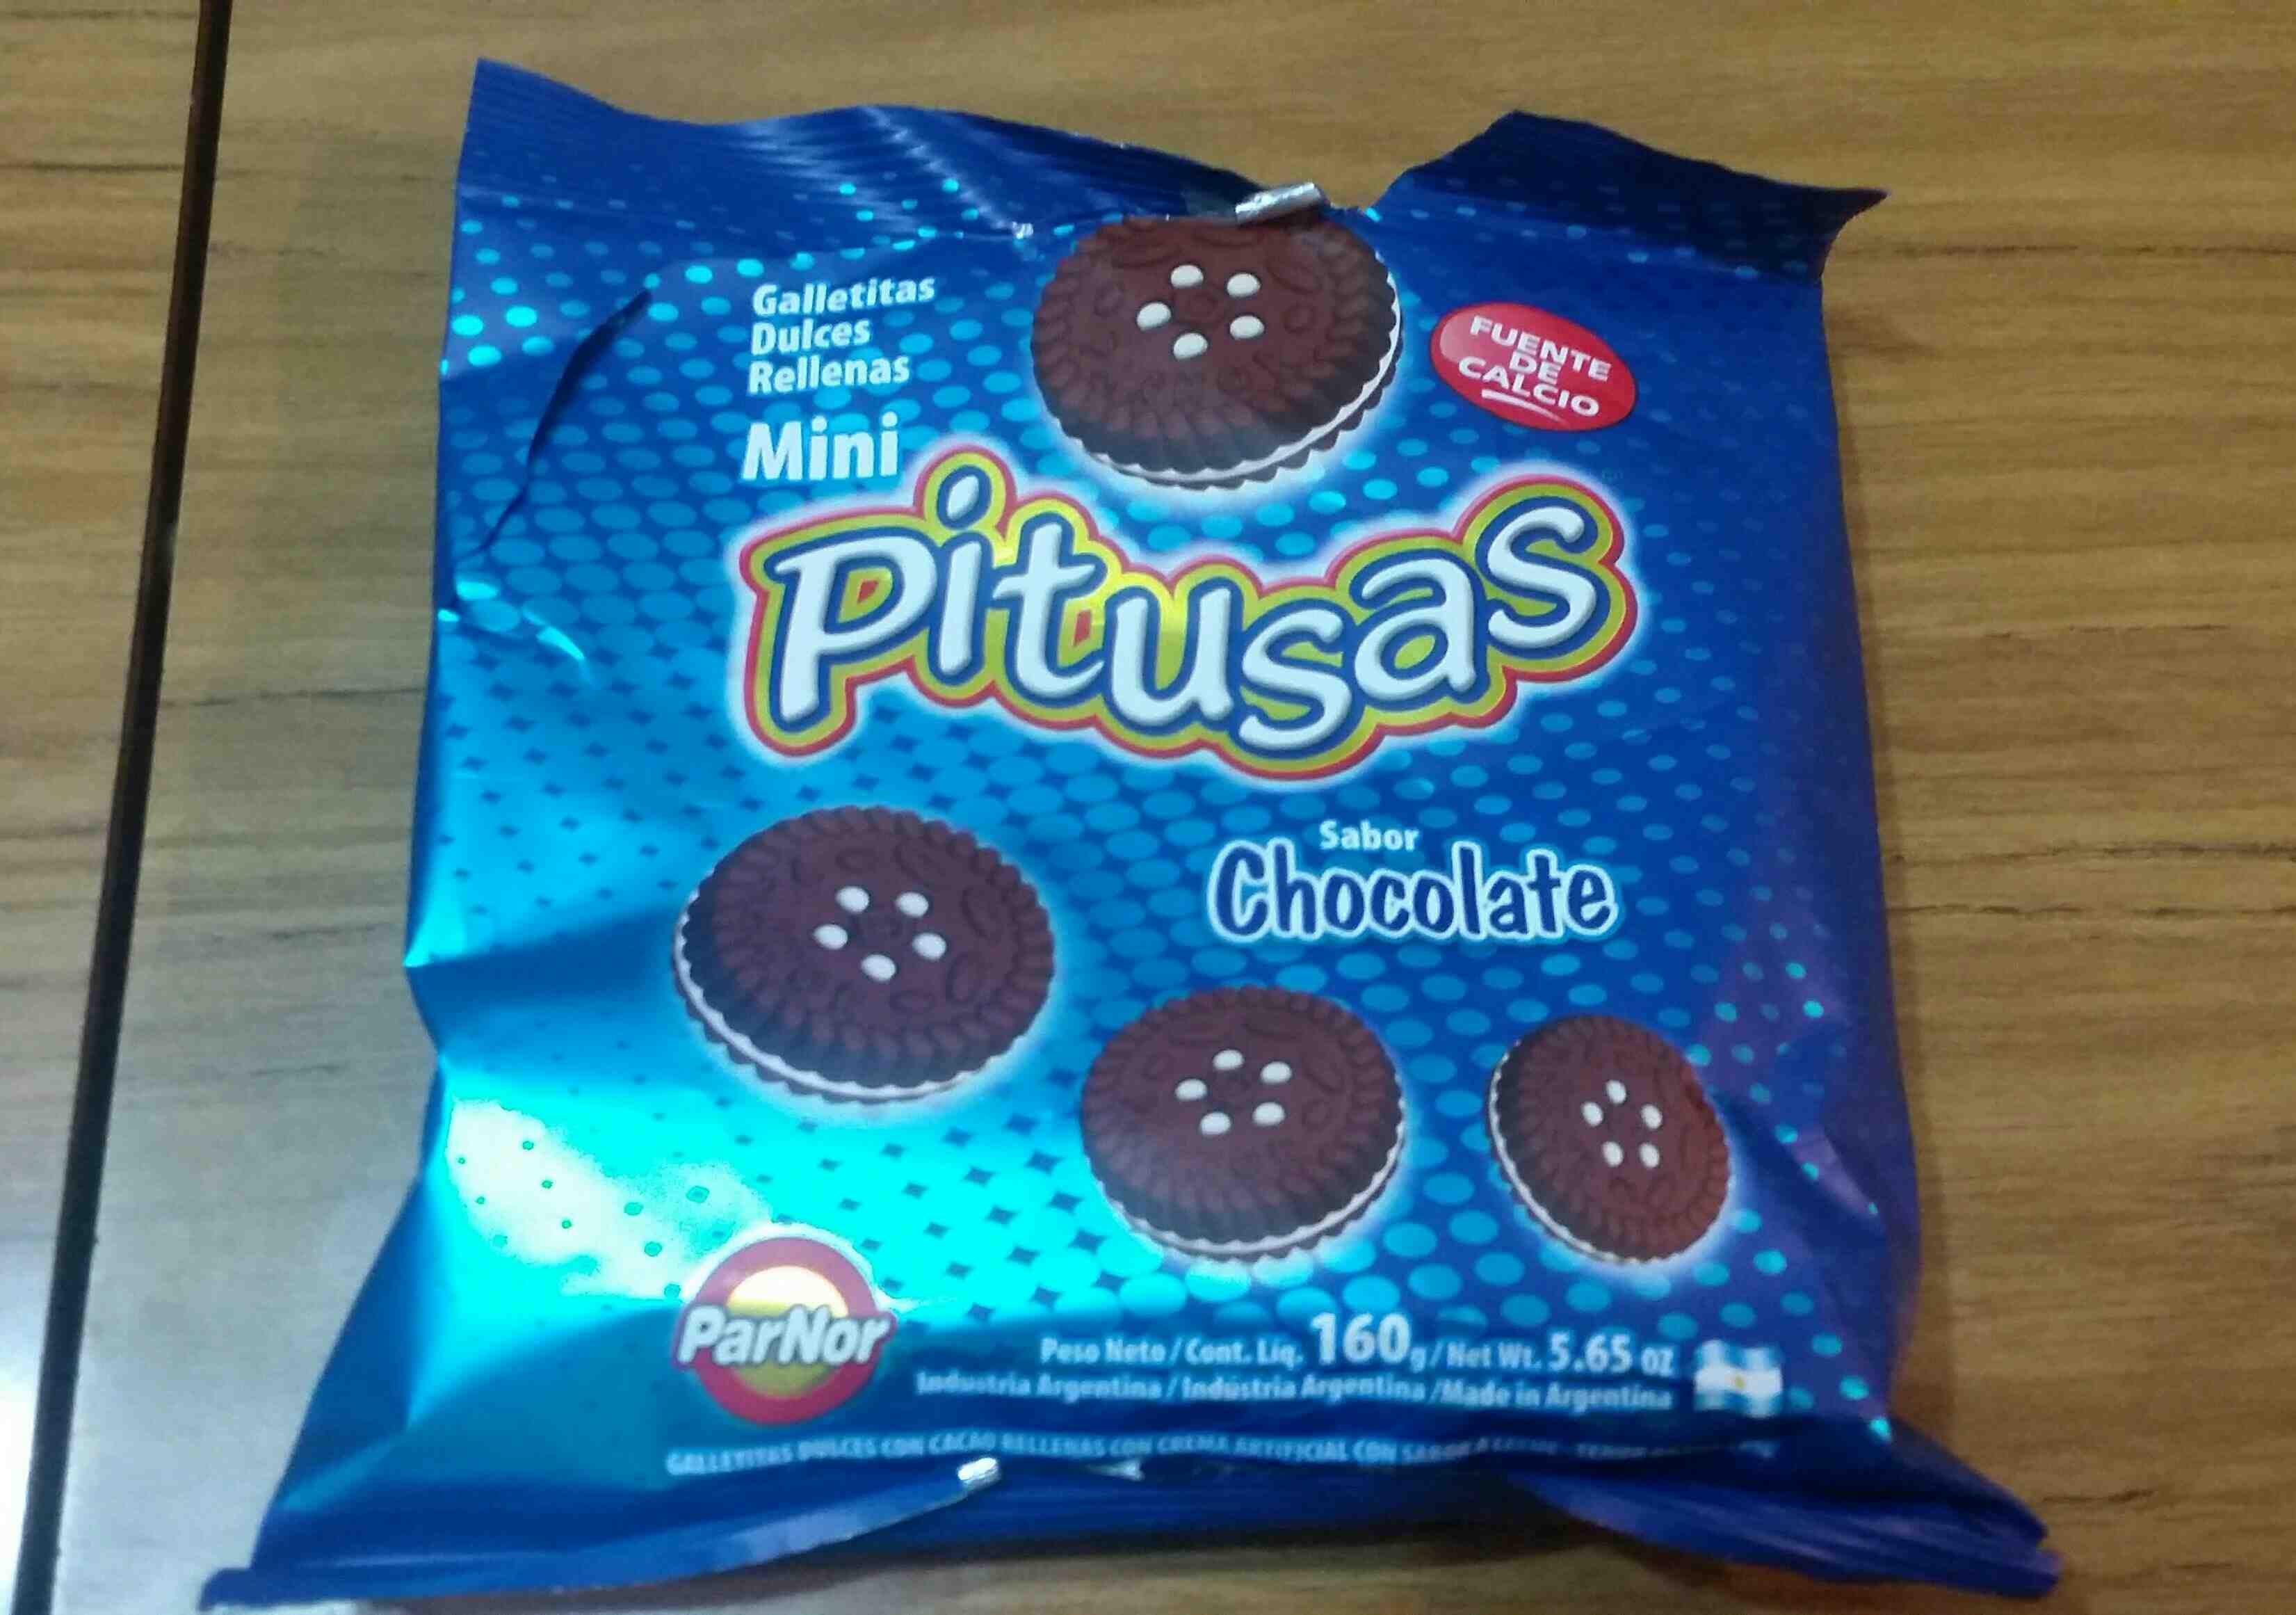 Pitusas - Product